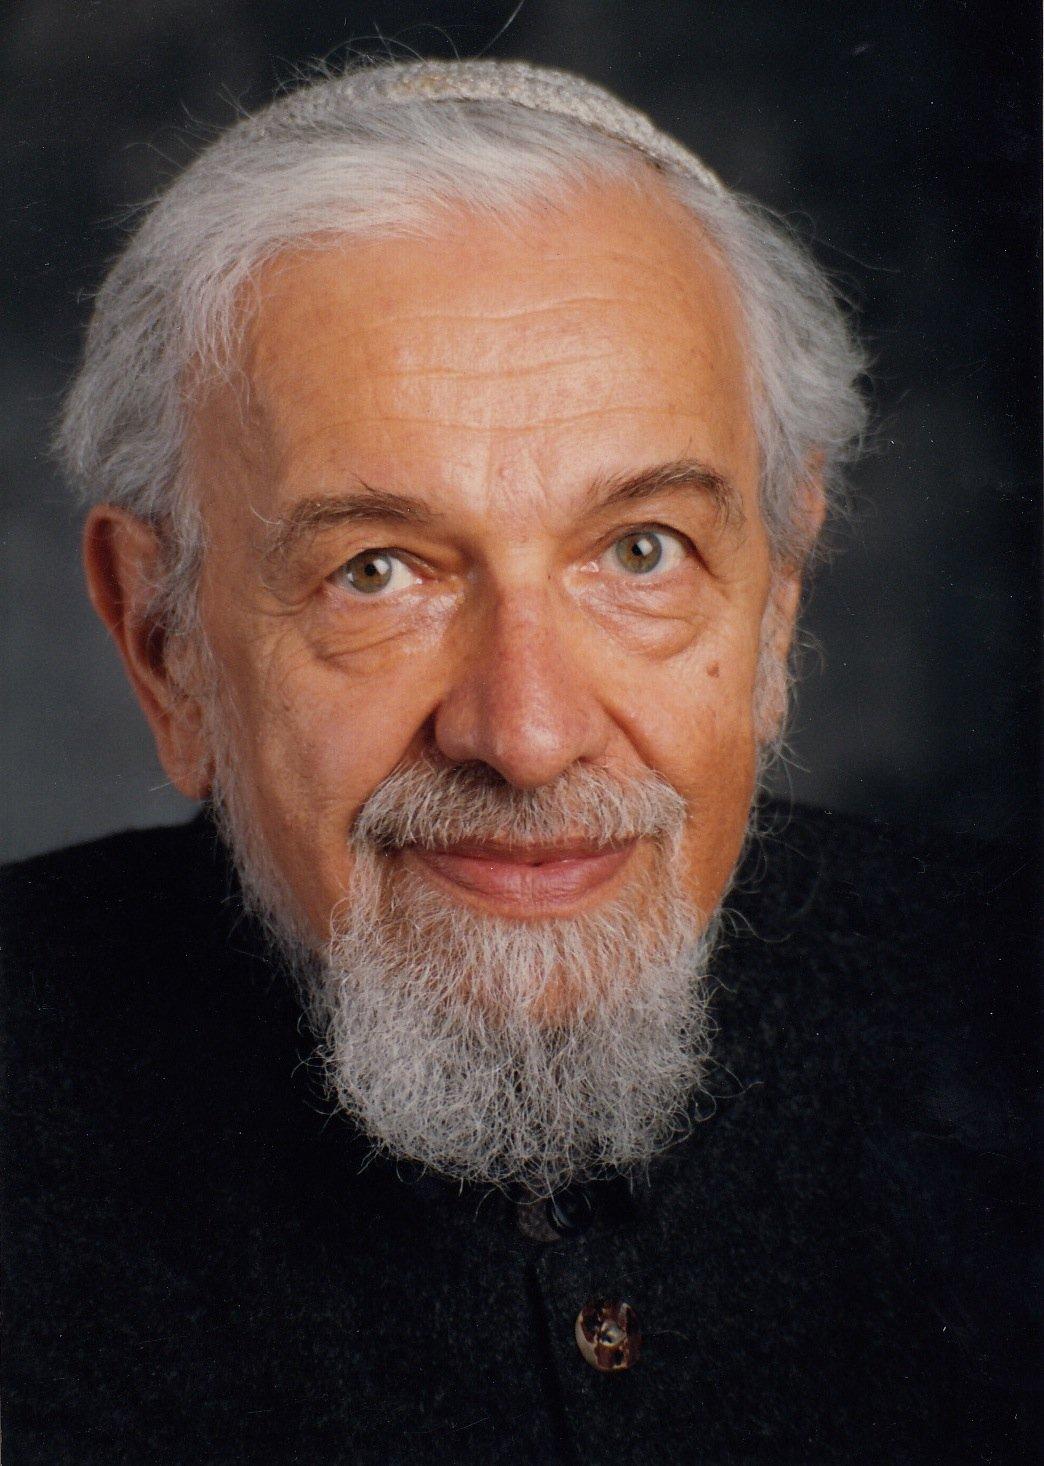 Rabbi Zalman Schachter-Shalomi, late 1990s.